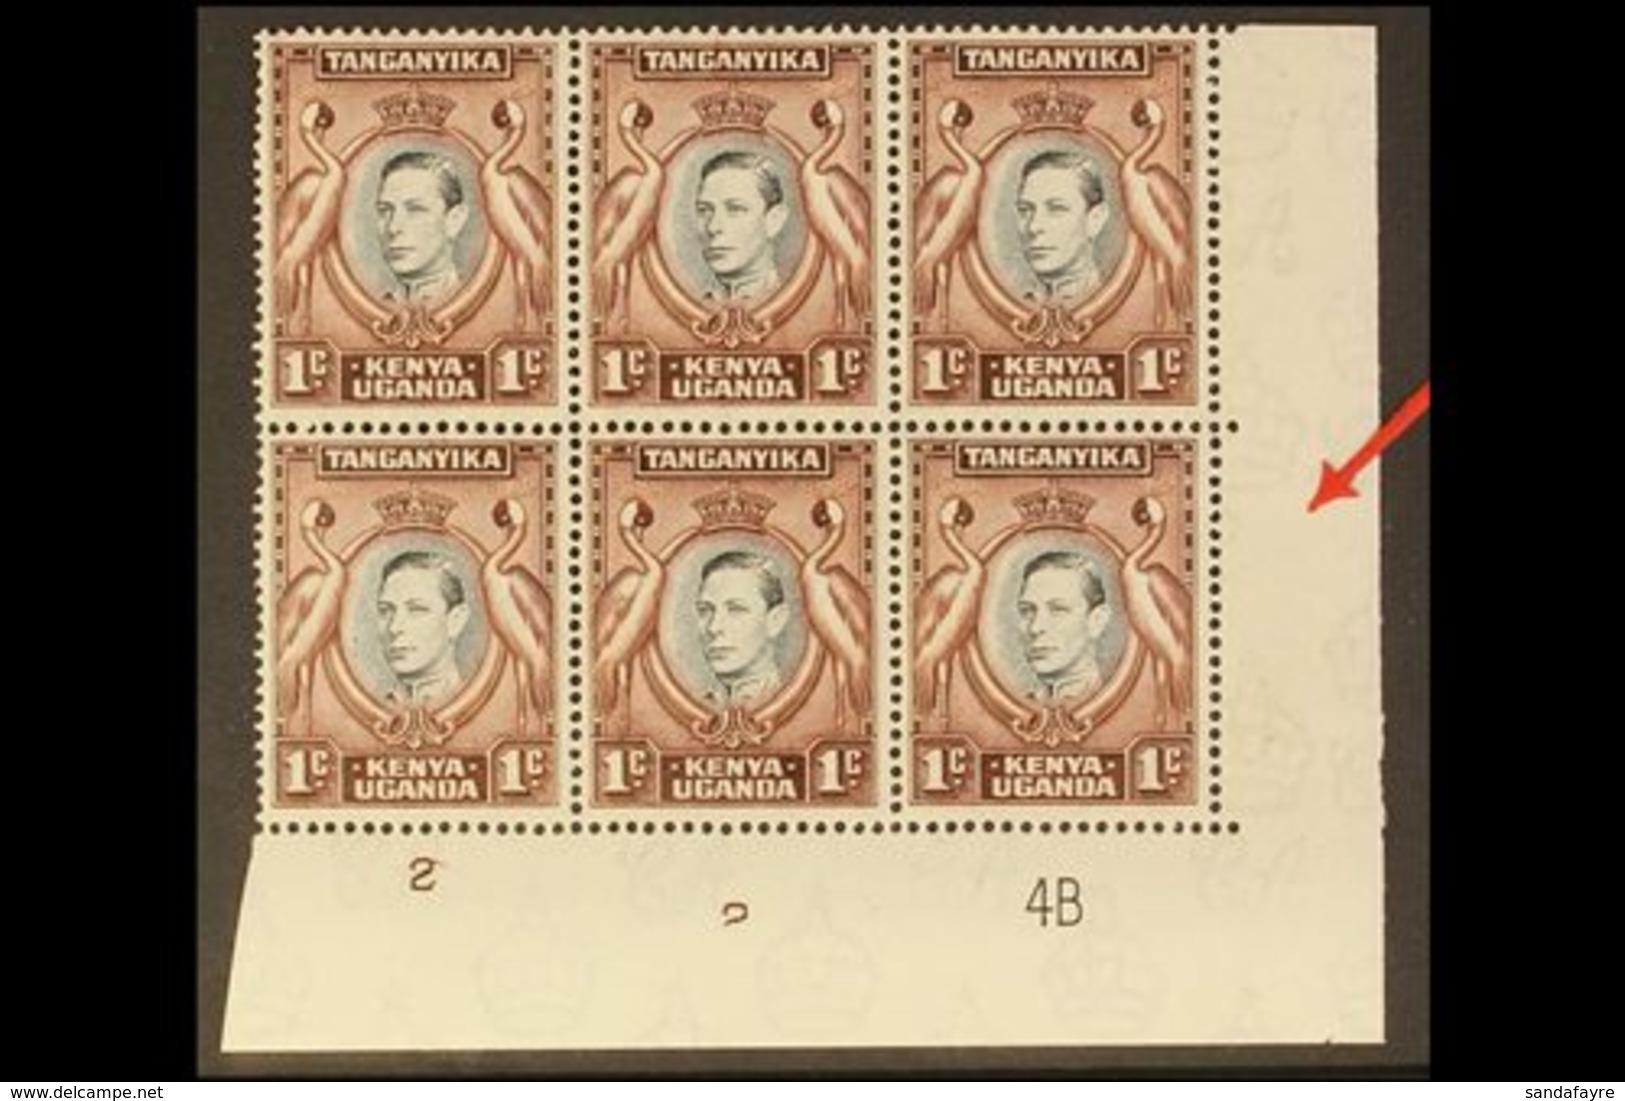 1938-54 1c Black & Chocolate Brown Perf 13¼x13¾, SG 131, Superb Never Hinged Mint Lower Right Corner Plate '2 4B' BLOCK  - Vide